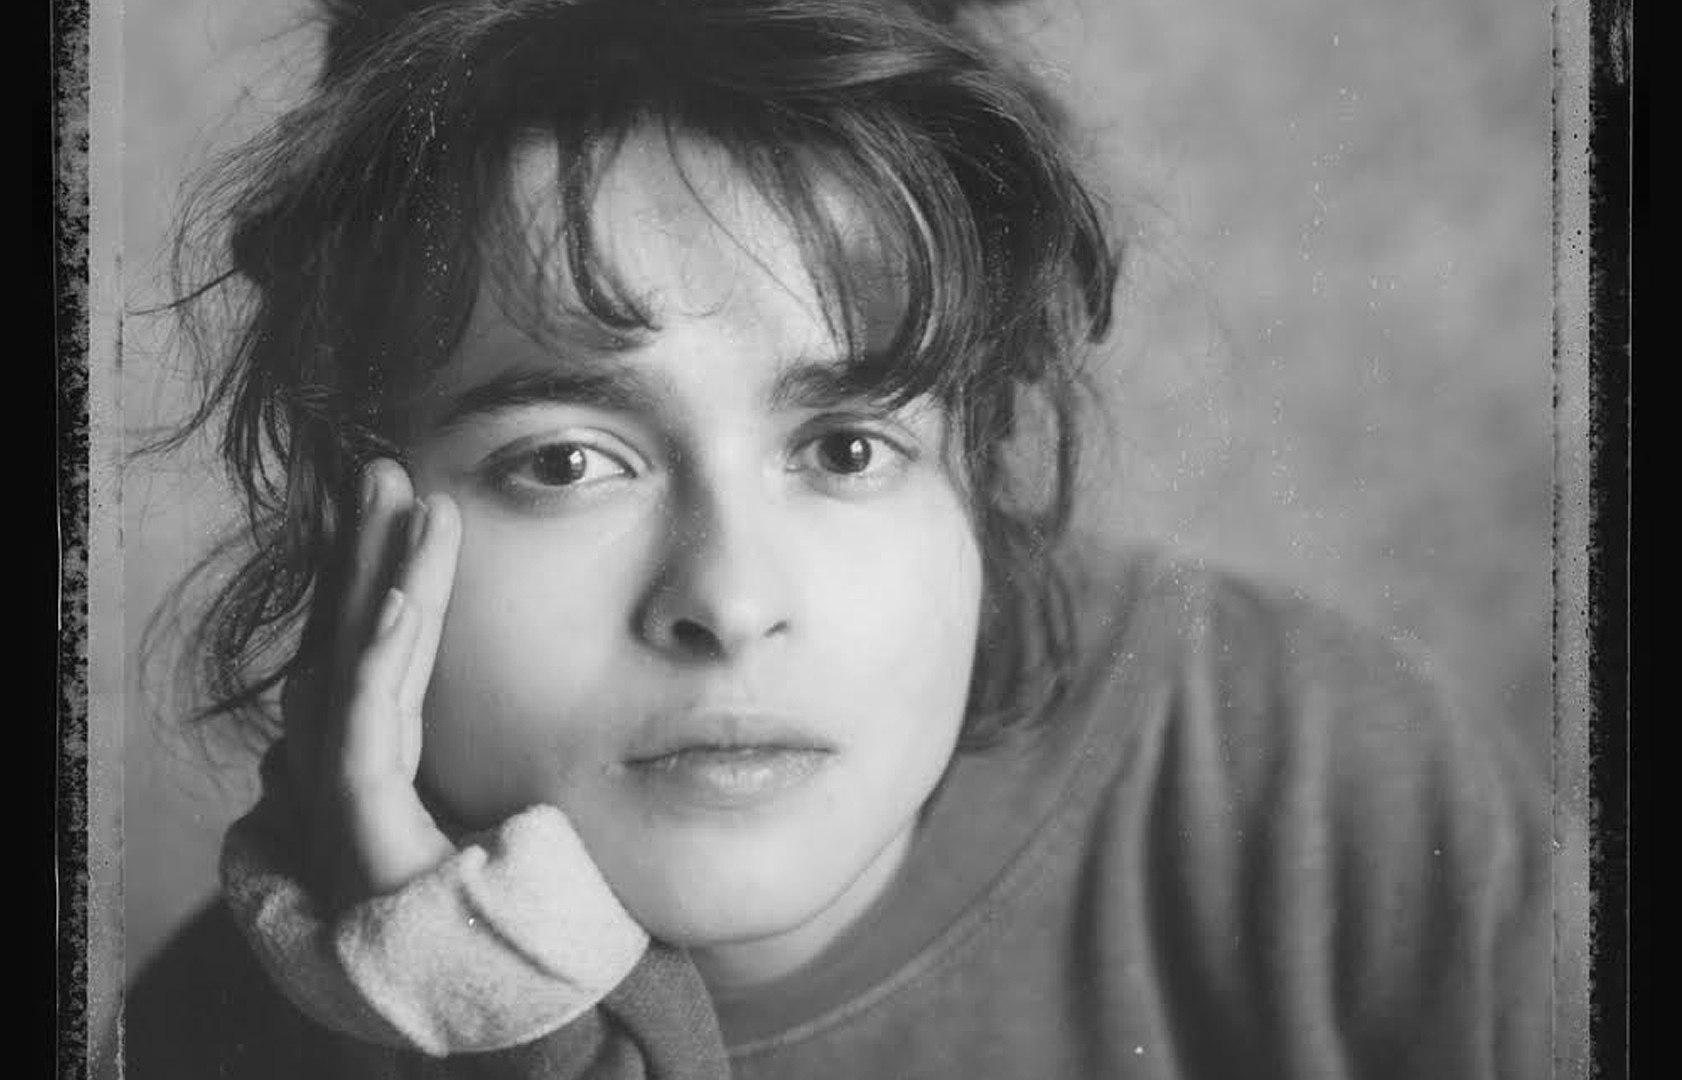 Helena Bonham Carter - Portrait by David Hevey (copyright David Hevey)